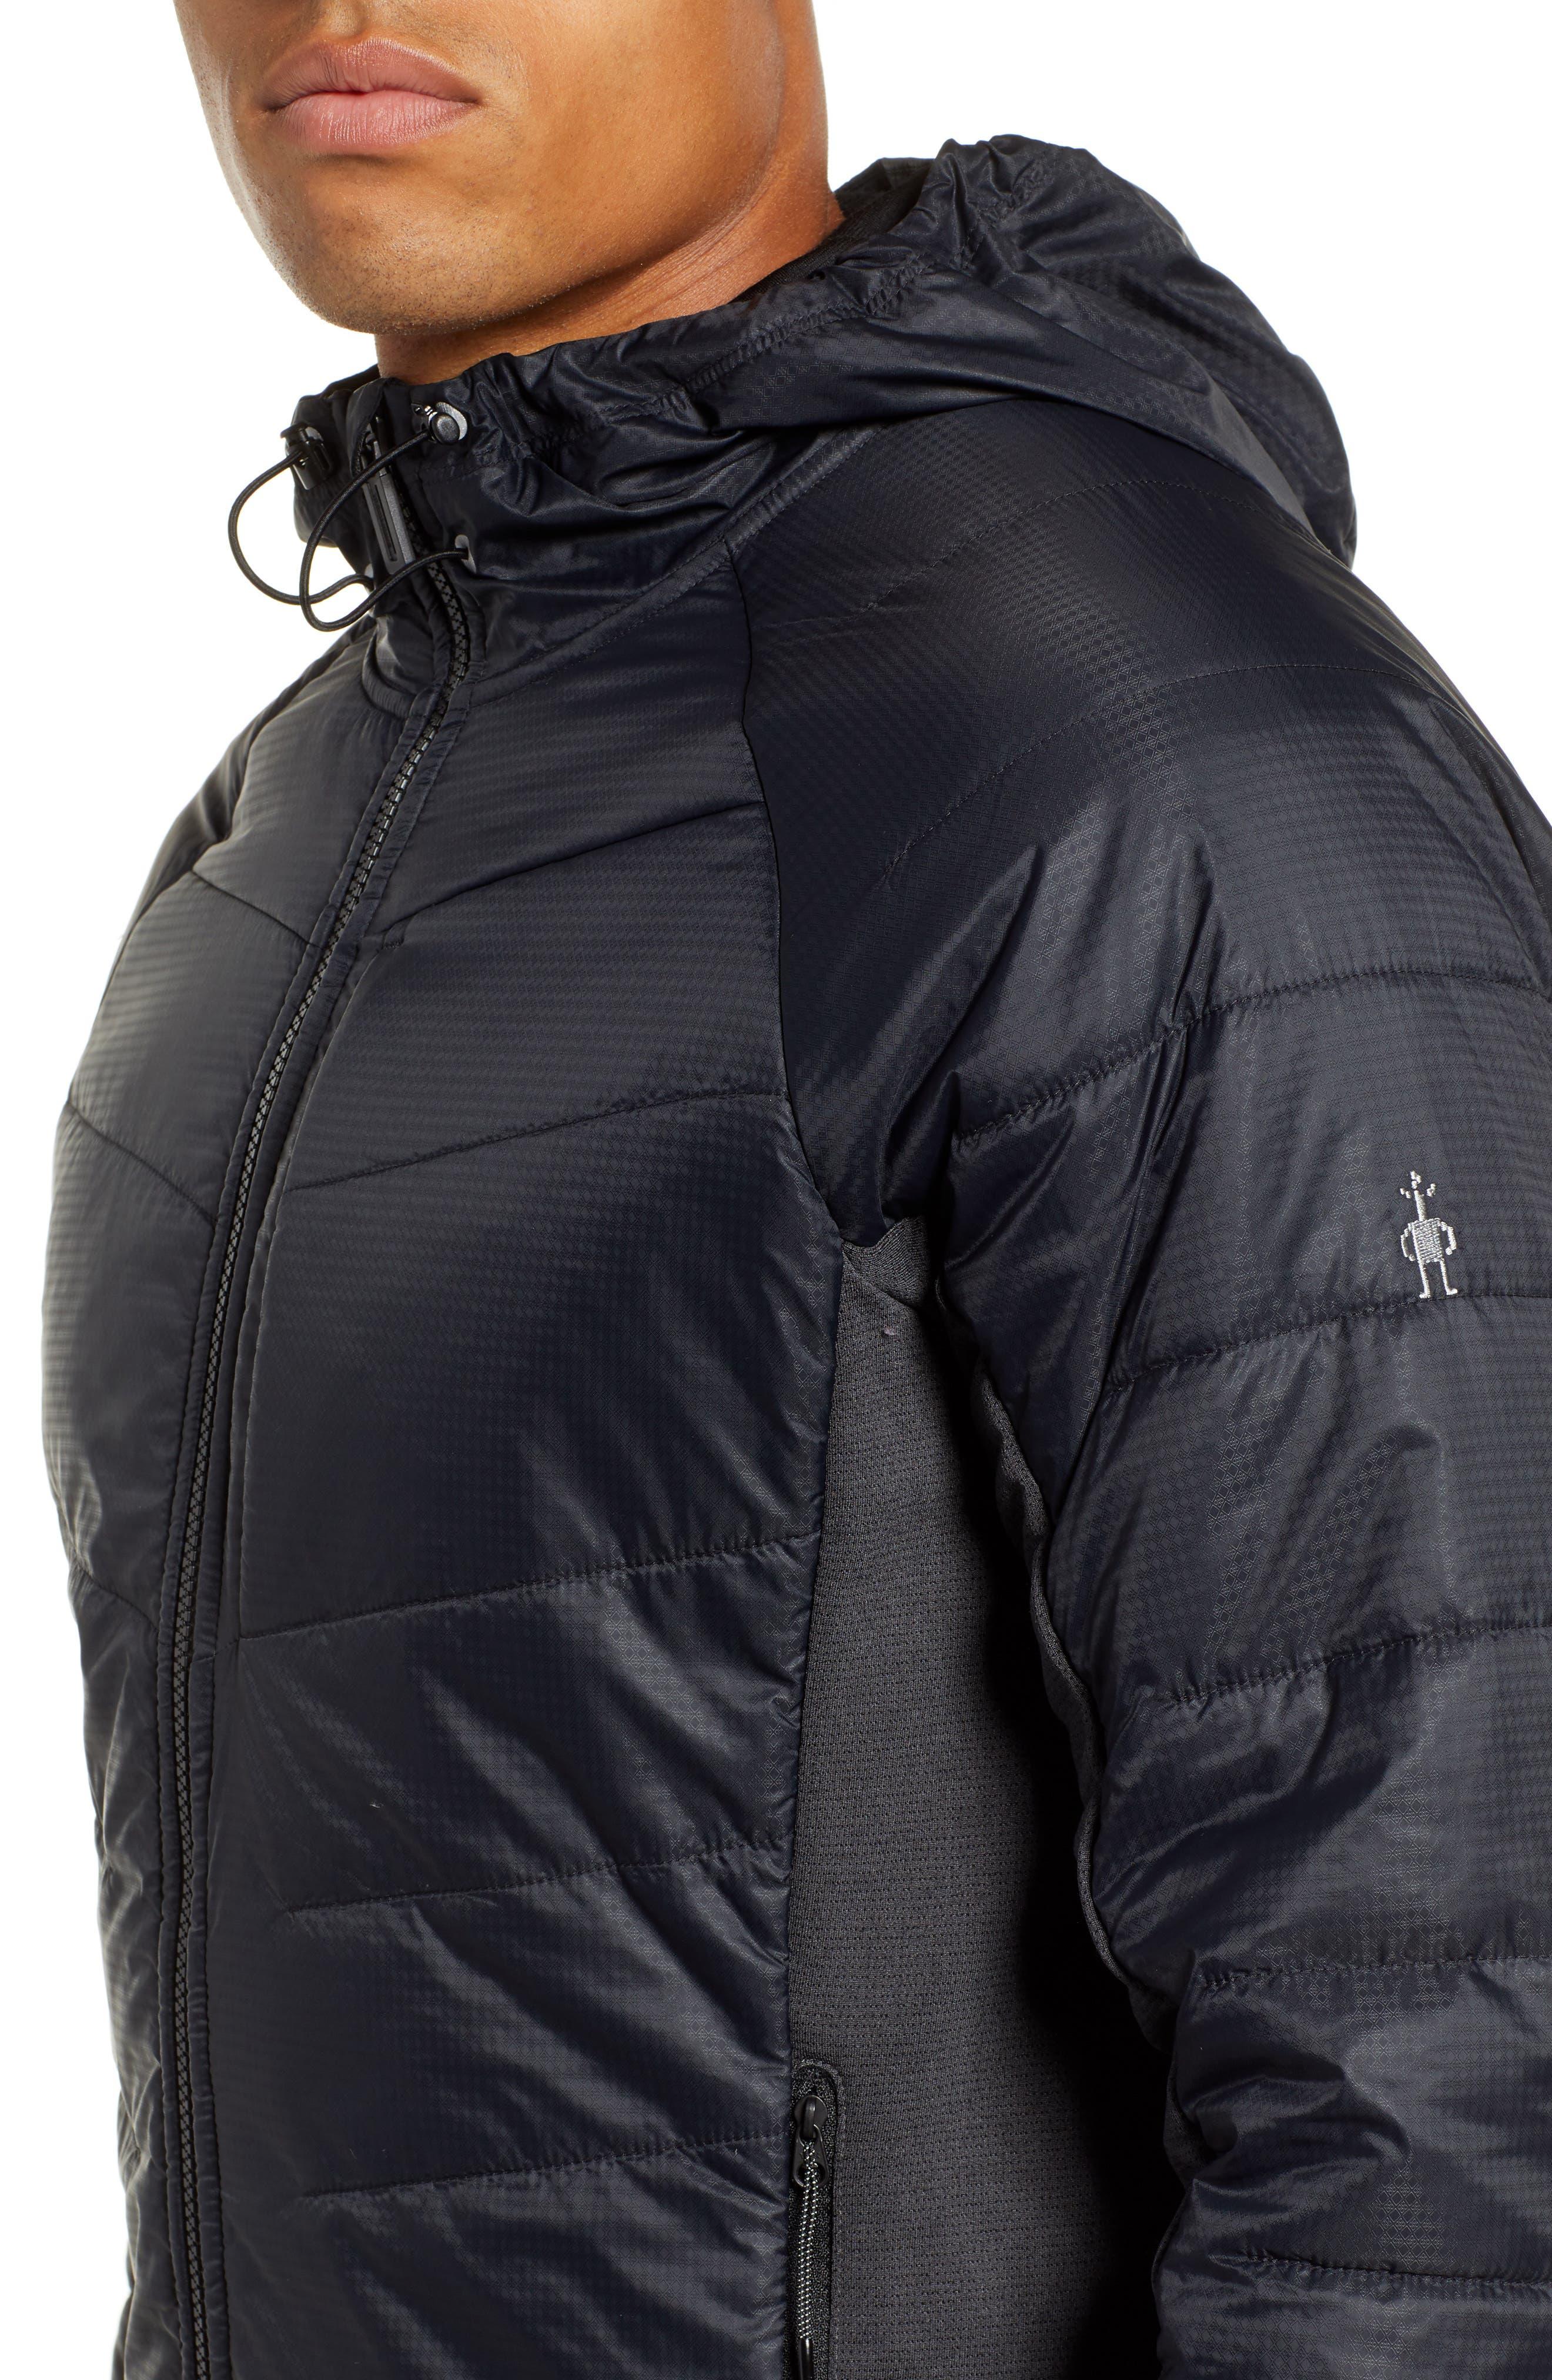 Smartloft 60 Hooded Jacket,                             Alternate thumbnail 4, color,                             BLACK